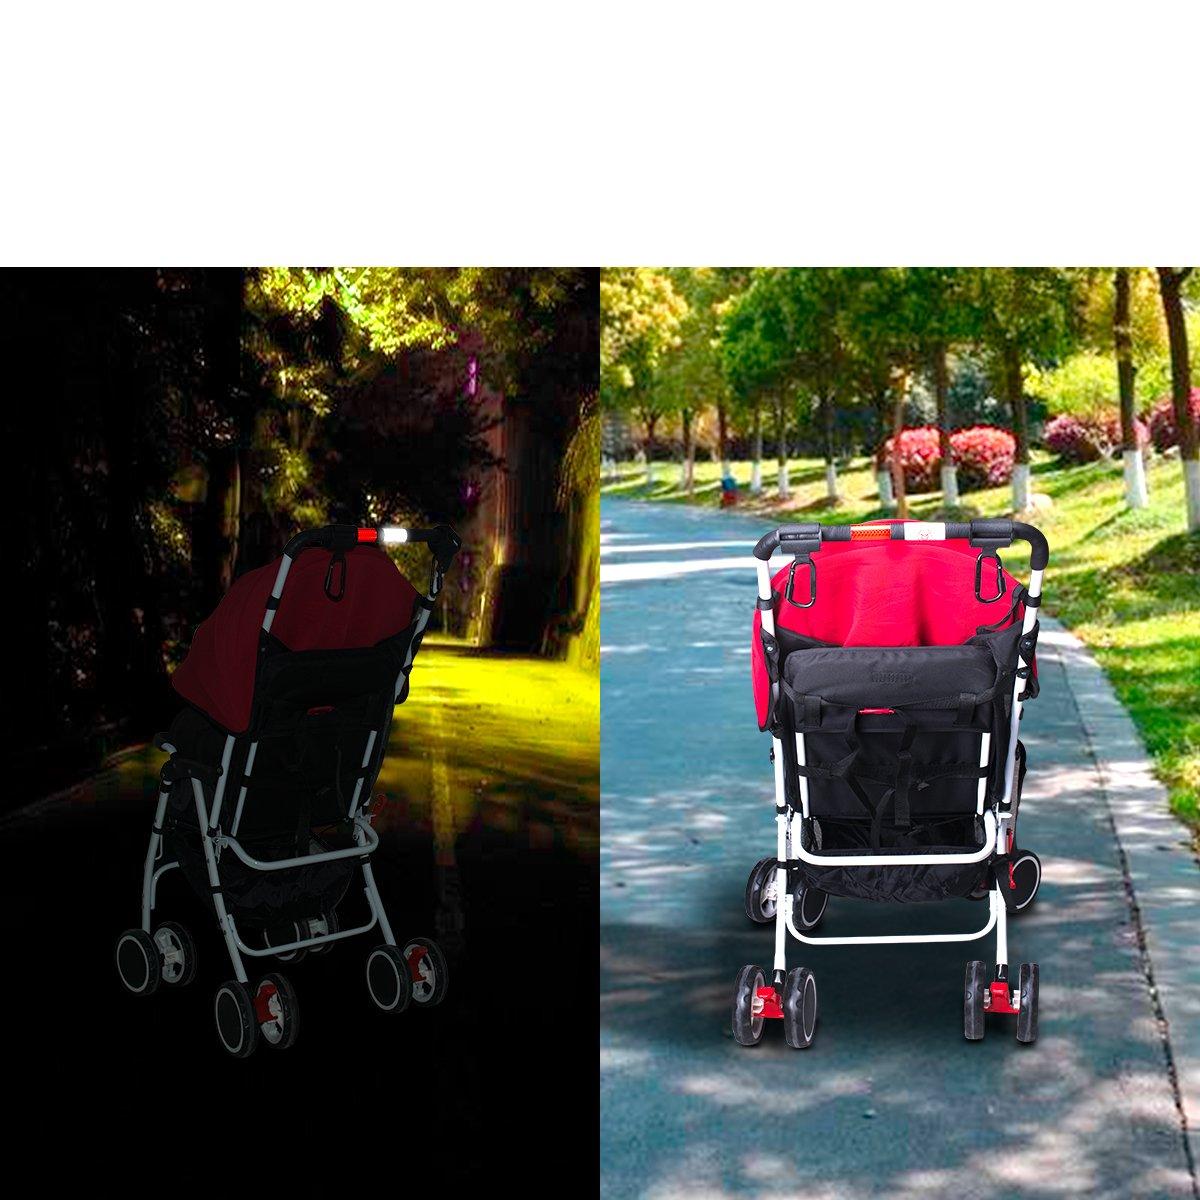 Stroller Hook Set, Pack of Handy Pram Hook Buggy Hanger Clip + Stroller Net Bag for Baby Diaper Bags Groceries Clothing Purse Stroller Accessories Kit Hangs for Jogging Walking/Shopping by fantaseal (Image #7)